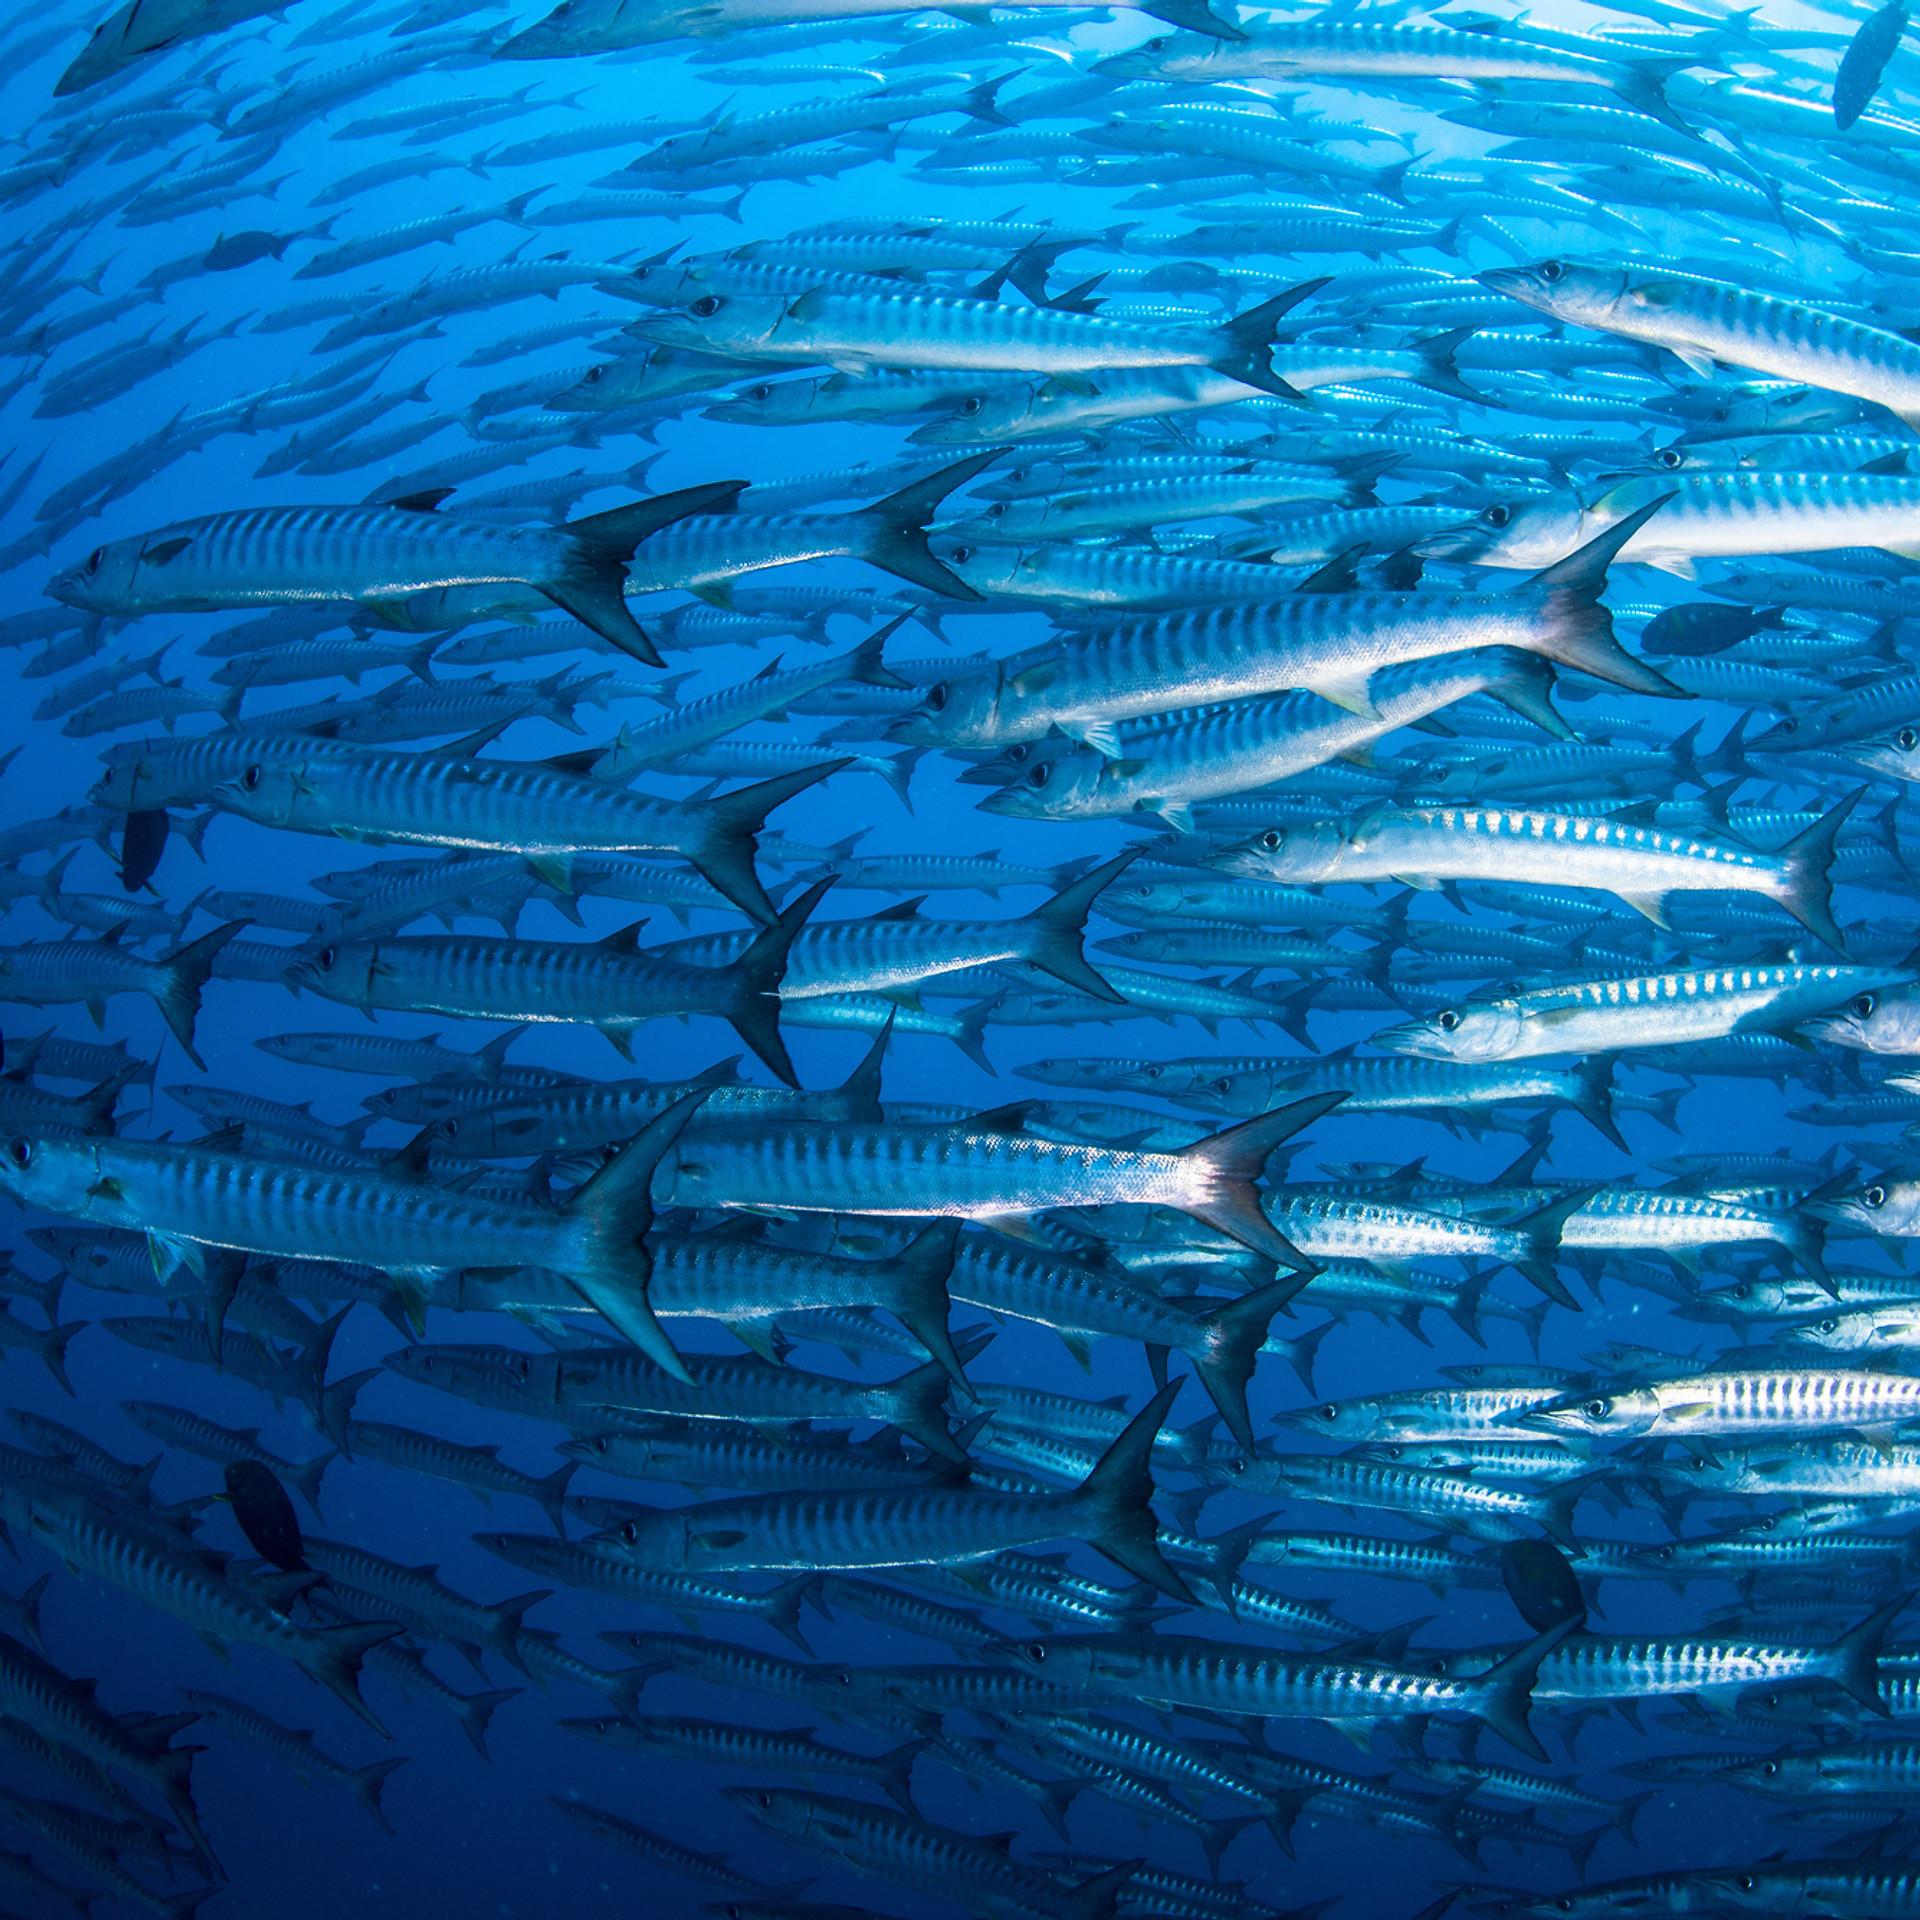 Pack of Barracudas